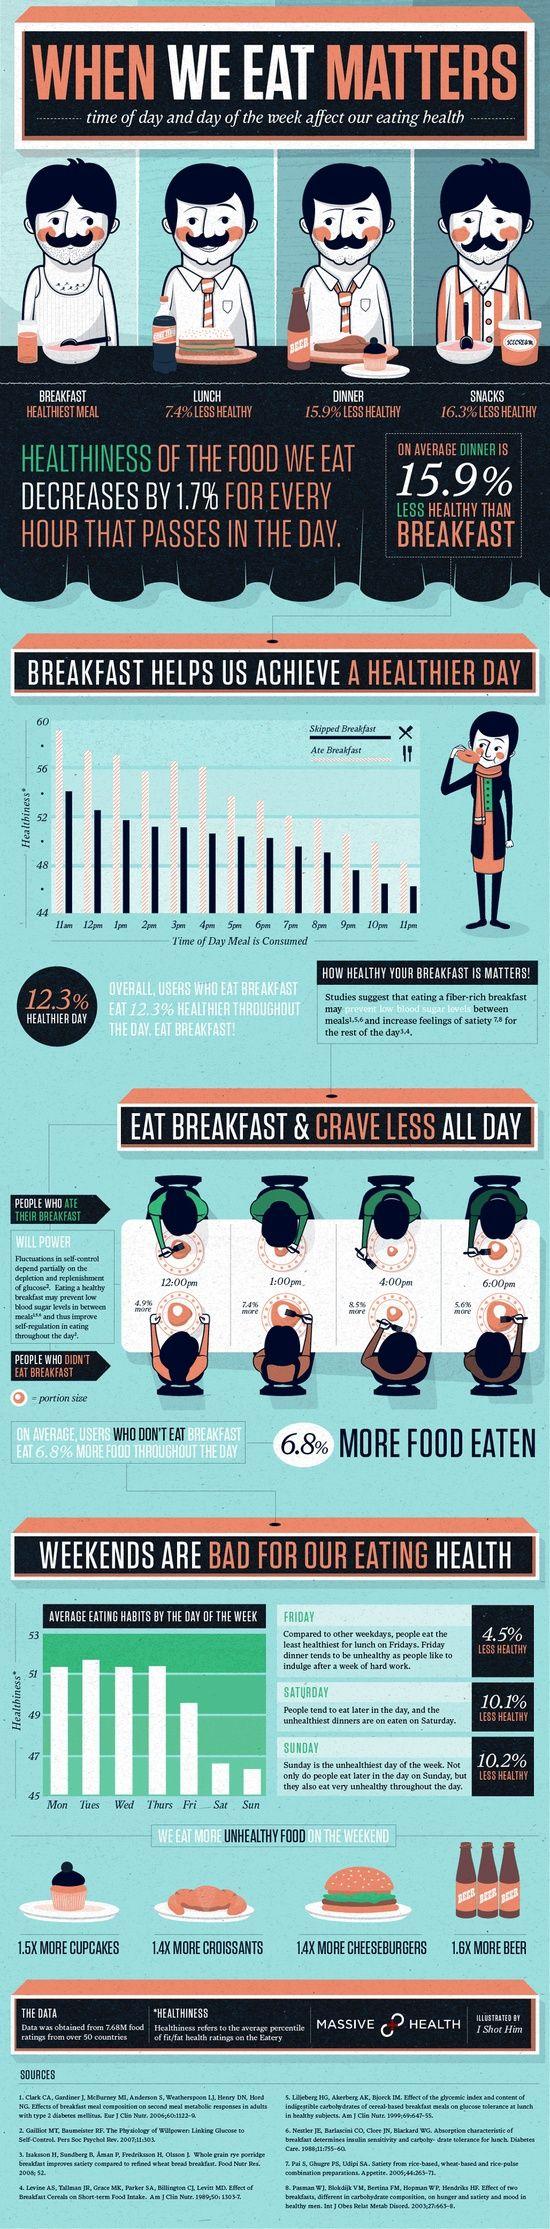 79 best InfoGraphics images on Pinterest   Ha ha, Funny stuff and ...